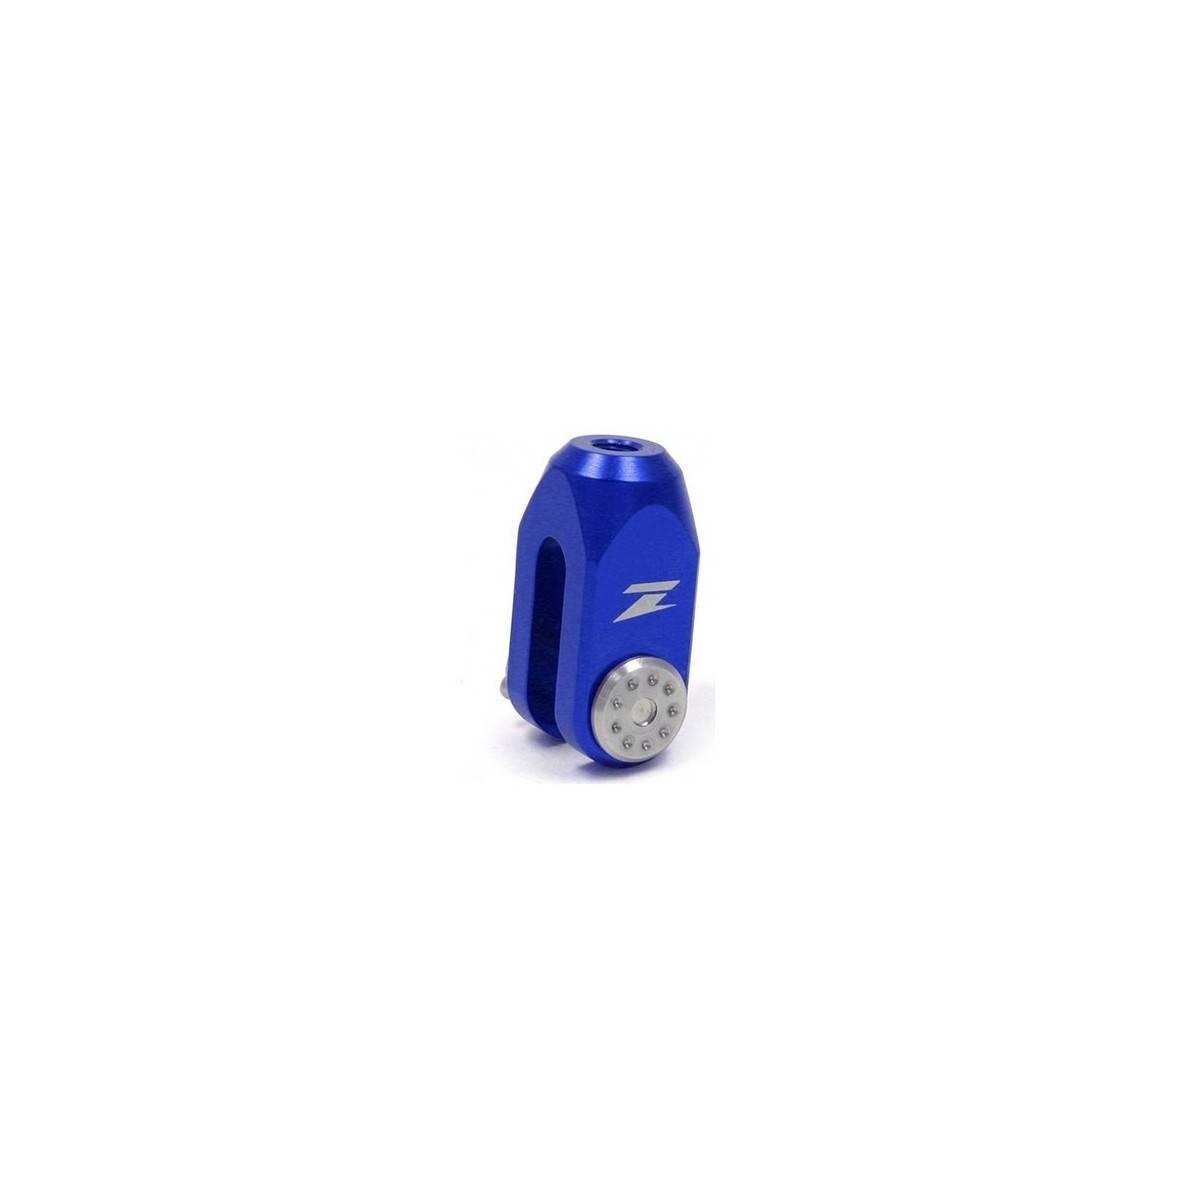 ZE94.0612 - Leva Cable Embrague Zeta Yz250F´06- Azul